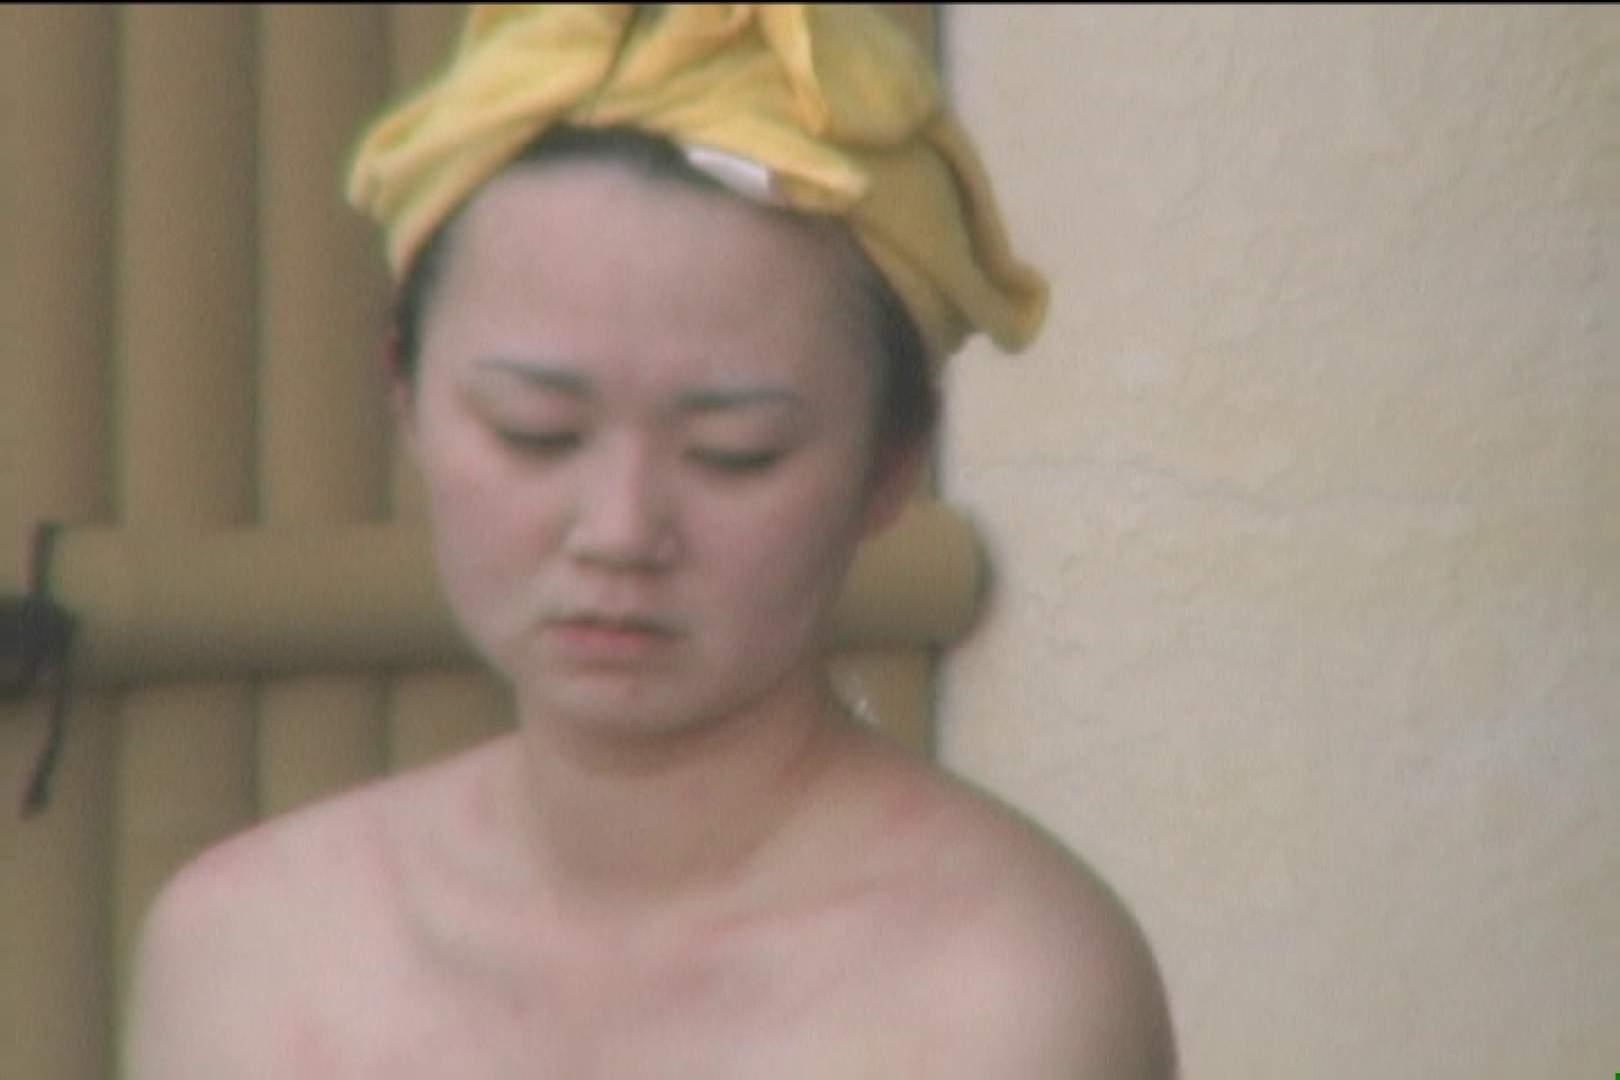 高画質露天女風呂観察 vol.018 女風呂 えろ無修正画像 104pic 6